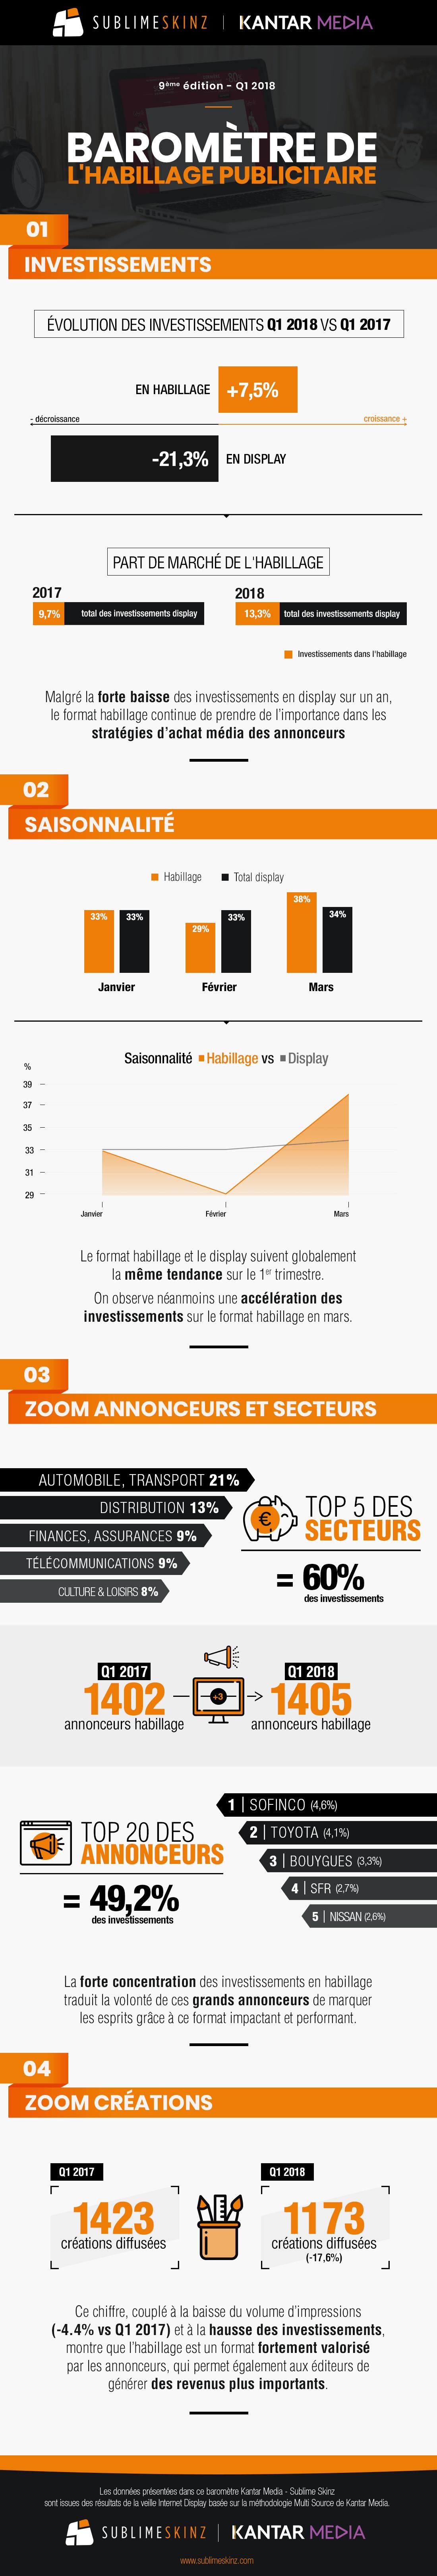 barometre-2018-q1